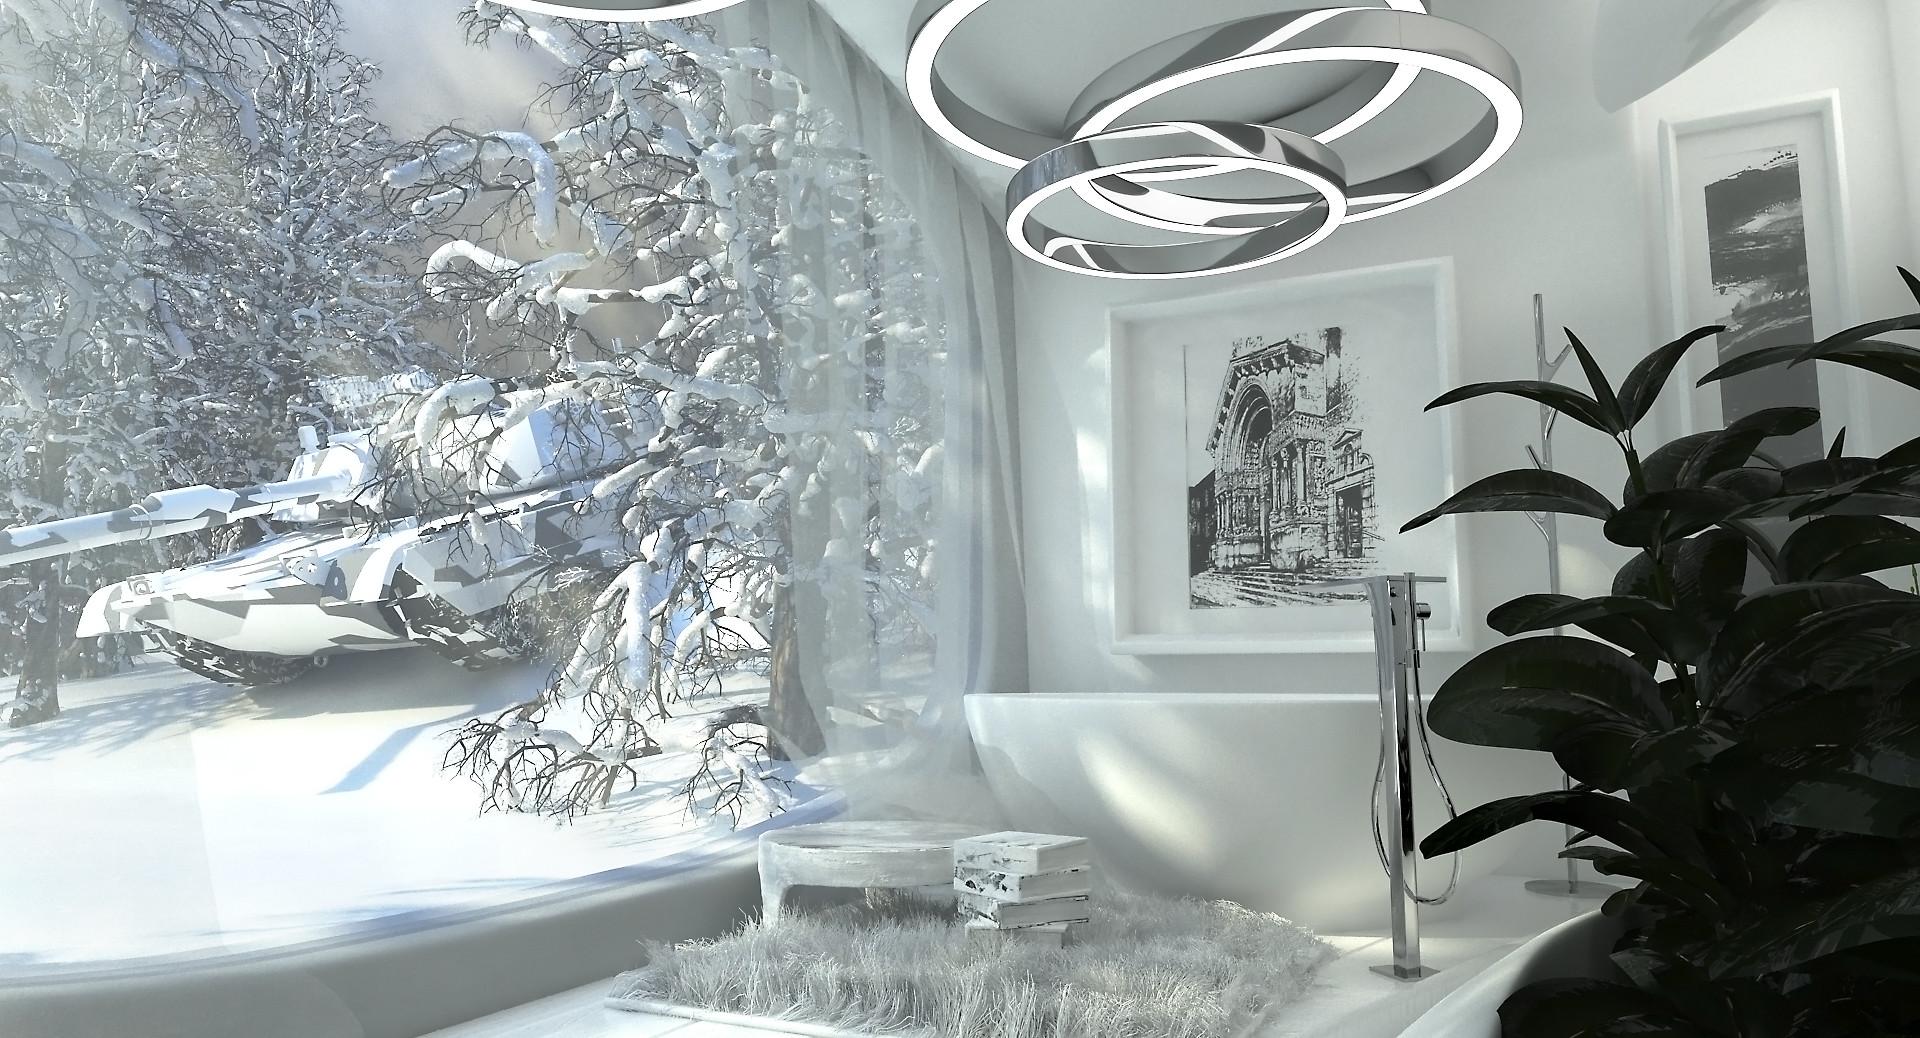 Andrzej Lewiski Futuristic Interior And Tank